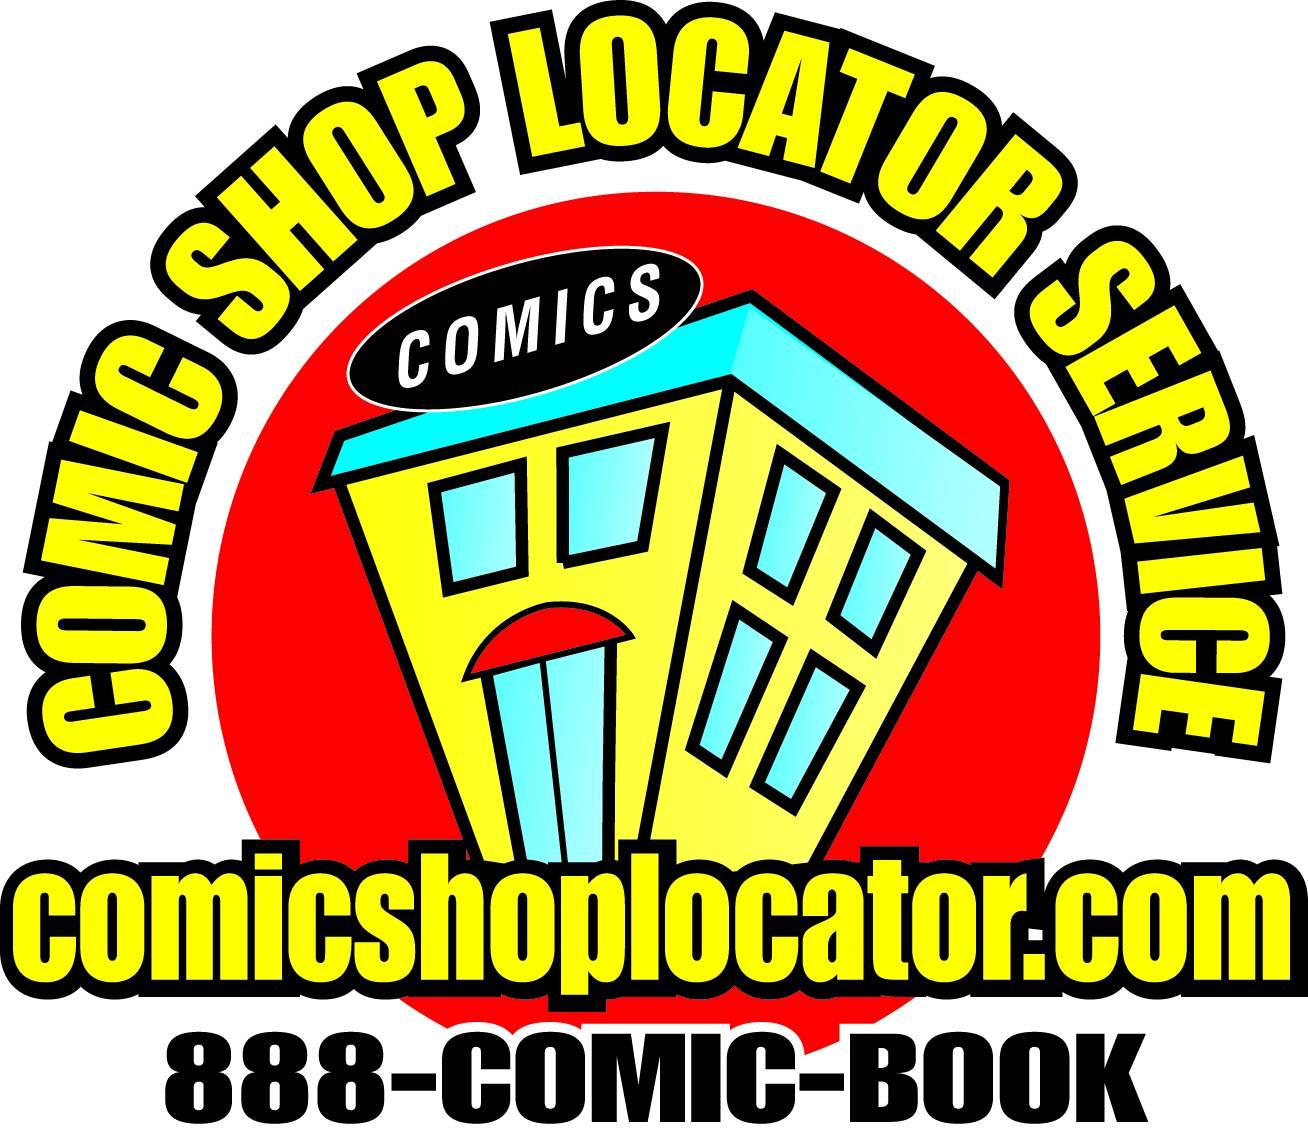 Comic Shop Locator link